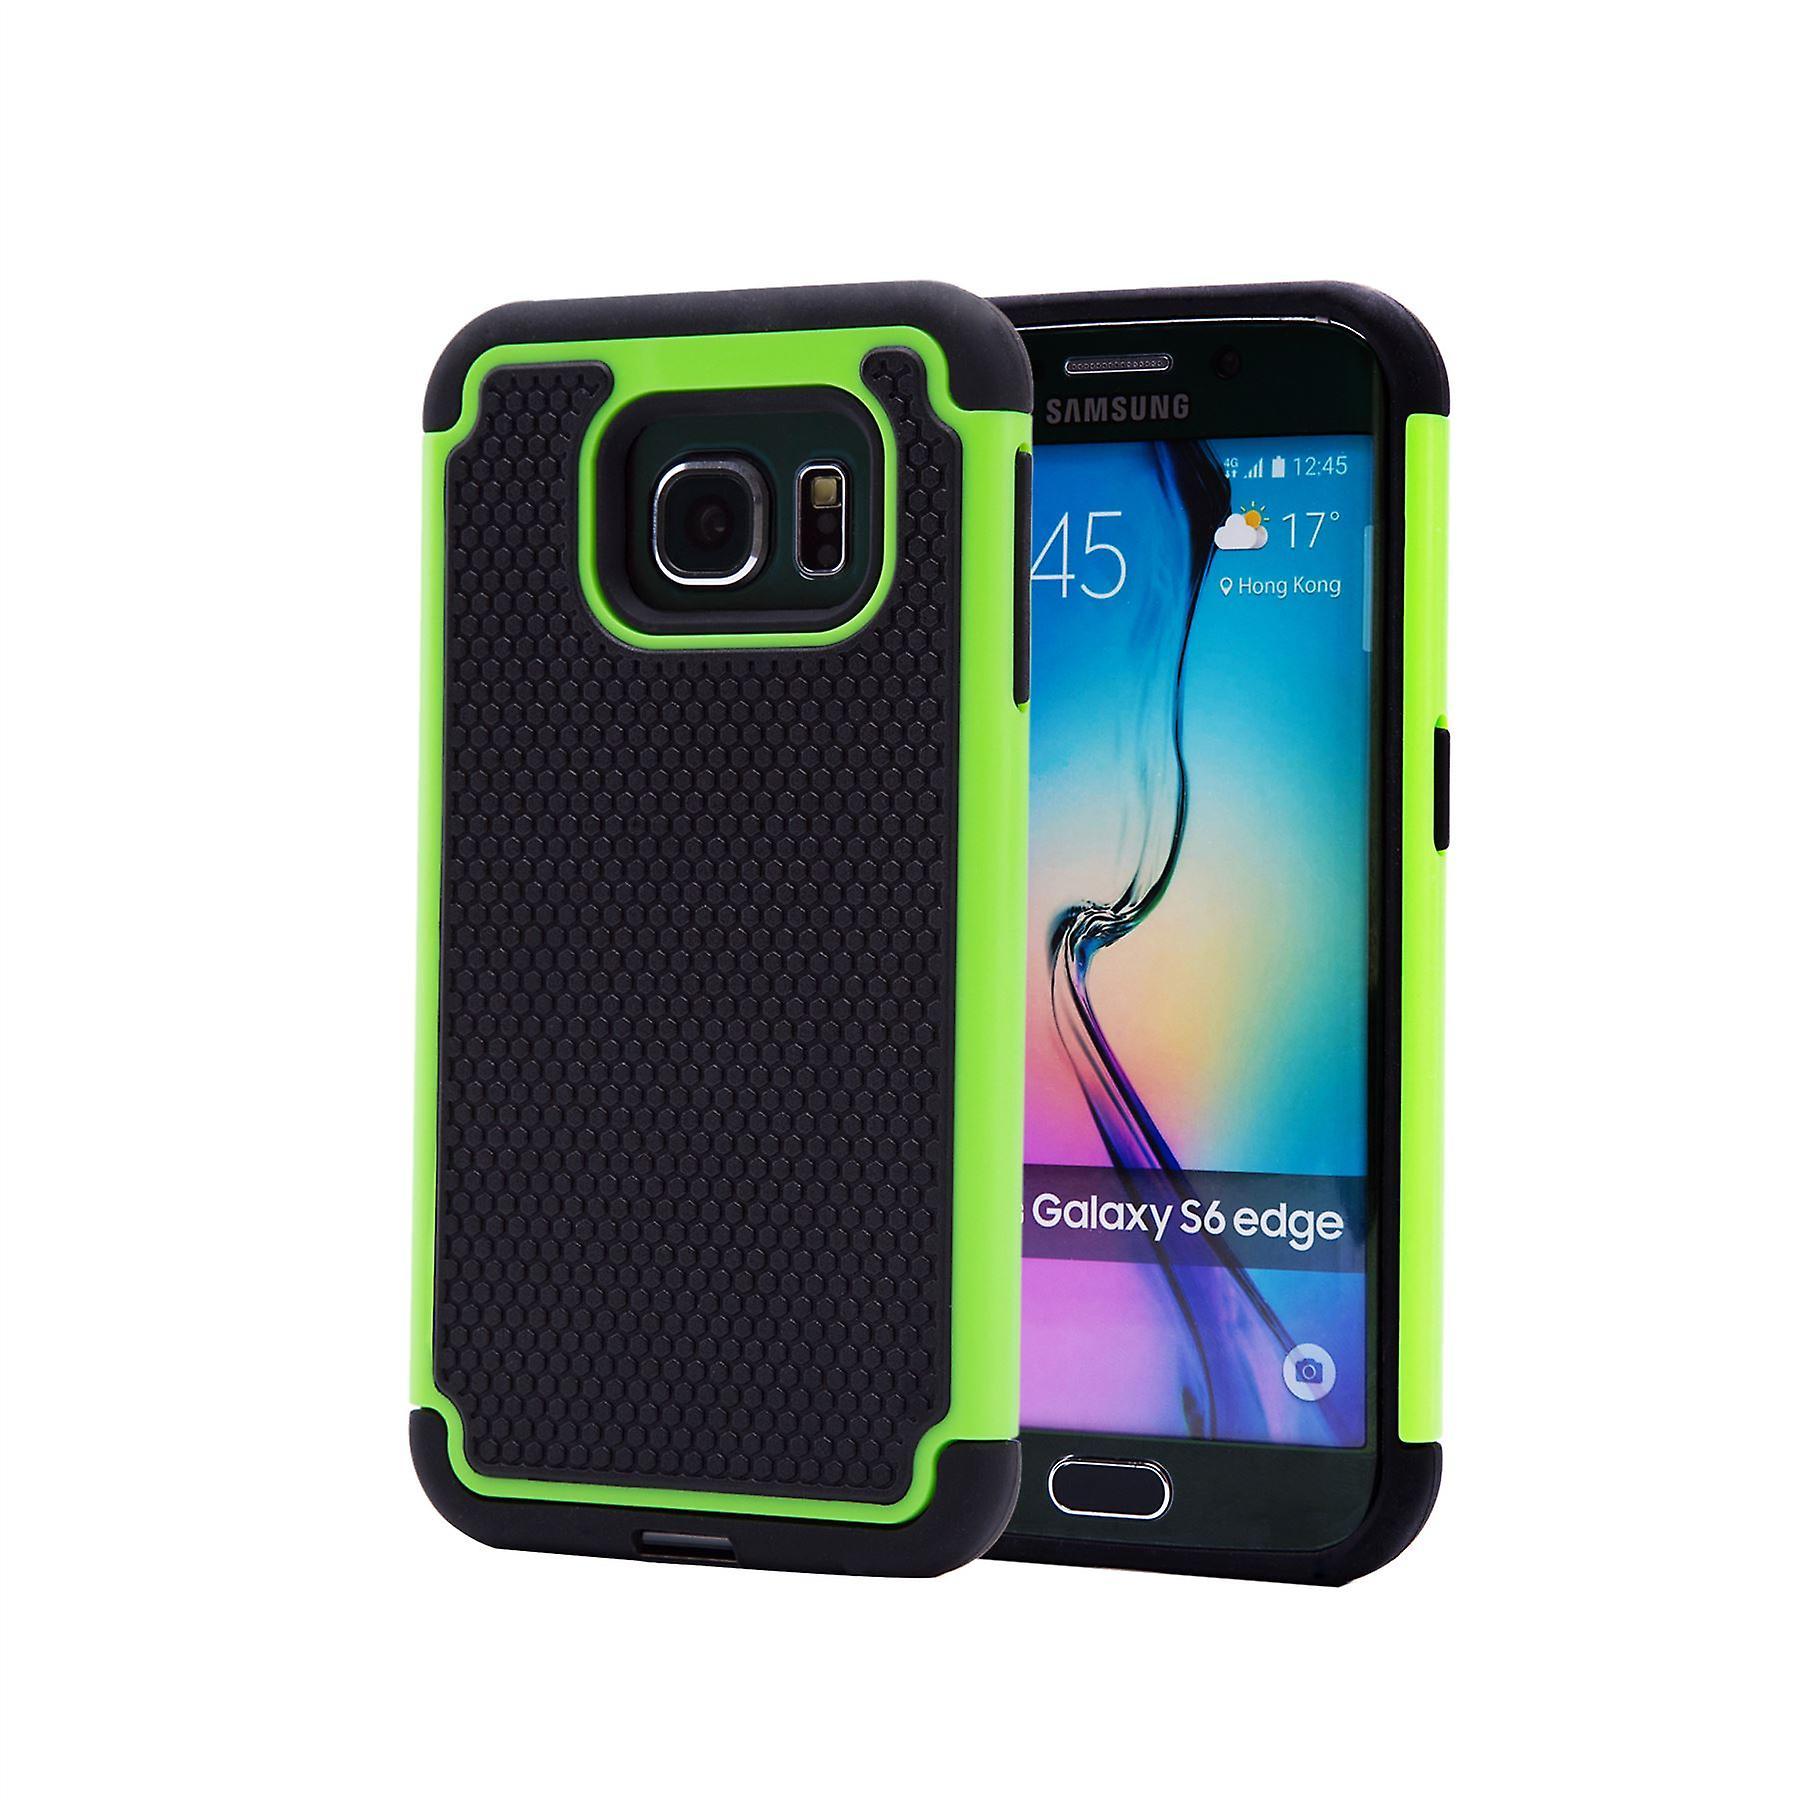 Shock proof case + stylus for Samsung Galaxy S6 Edge (SM-G925) - Green